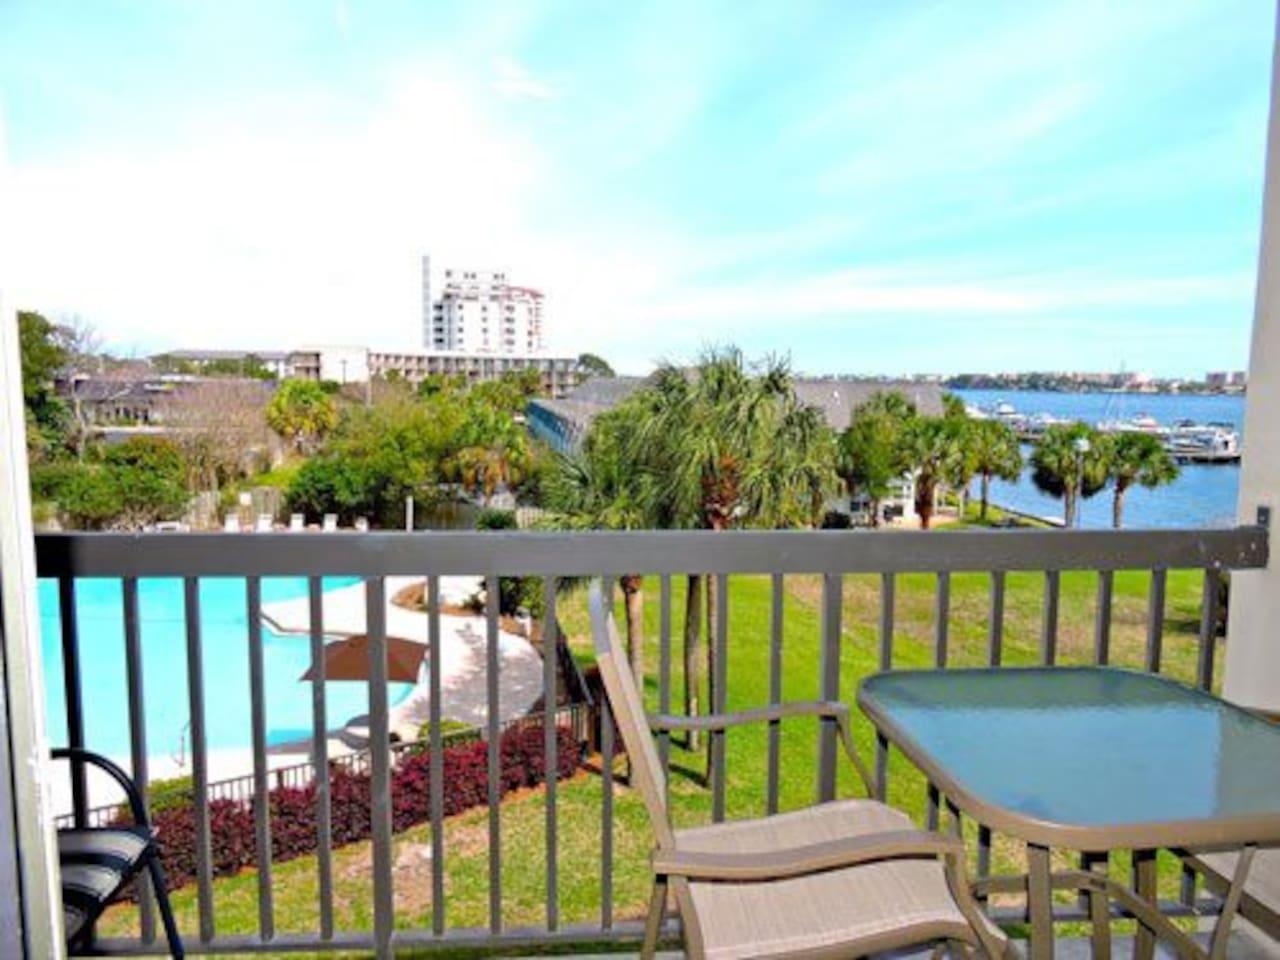 Private balcony overlooking the pool, marina, Santa Rosa sound and Okaloosa Island